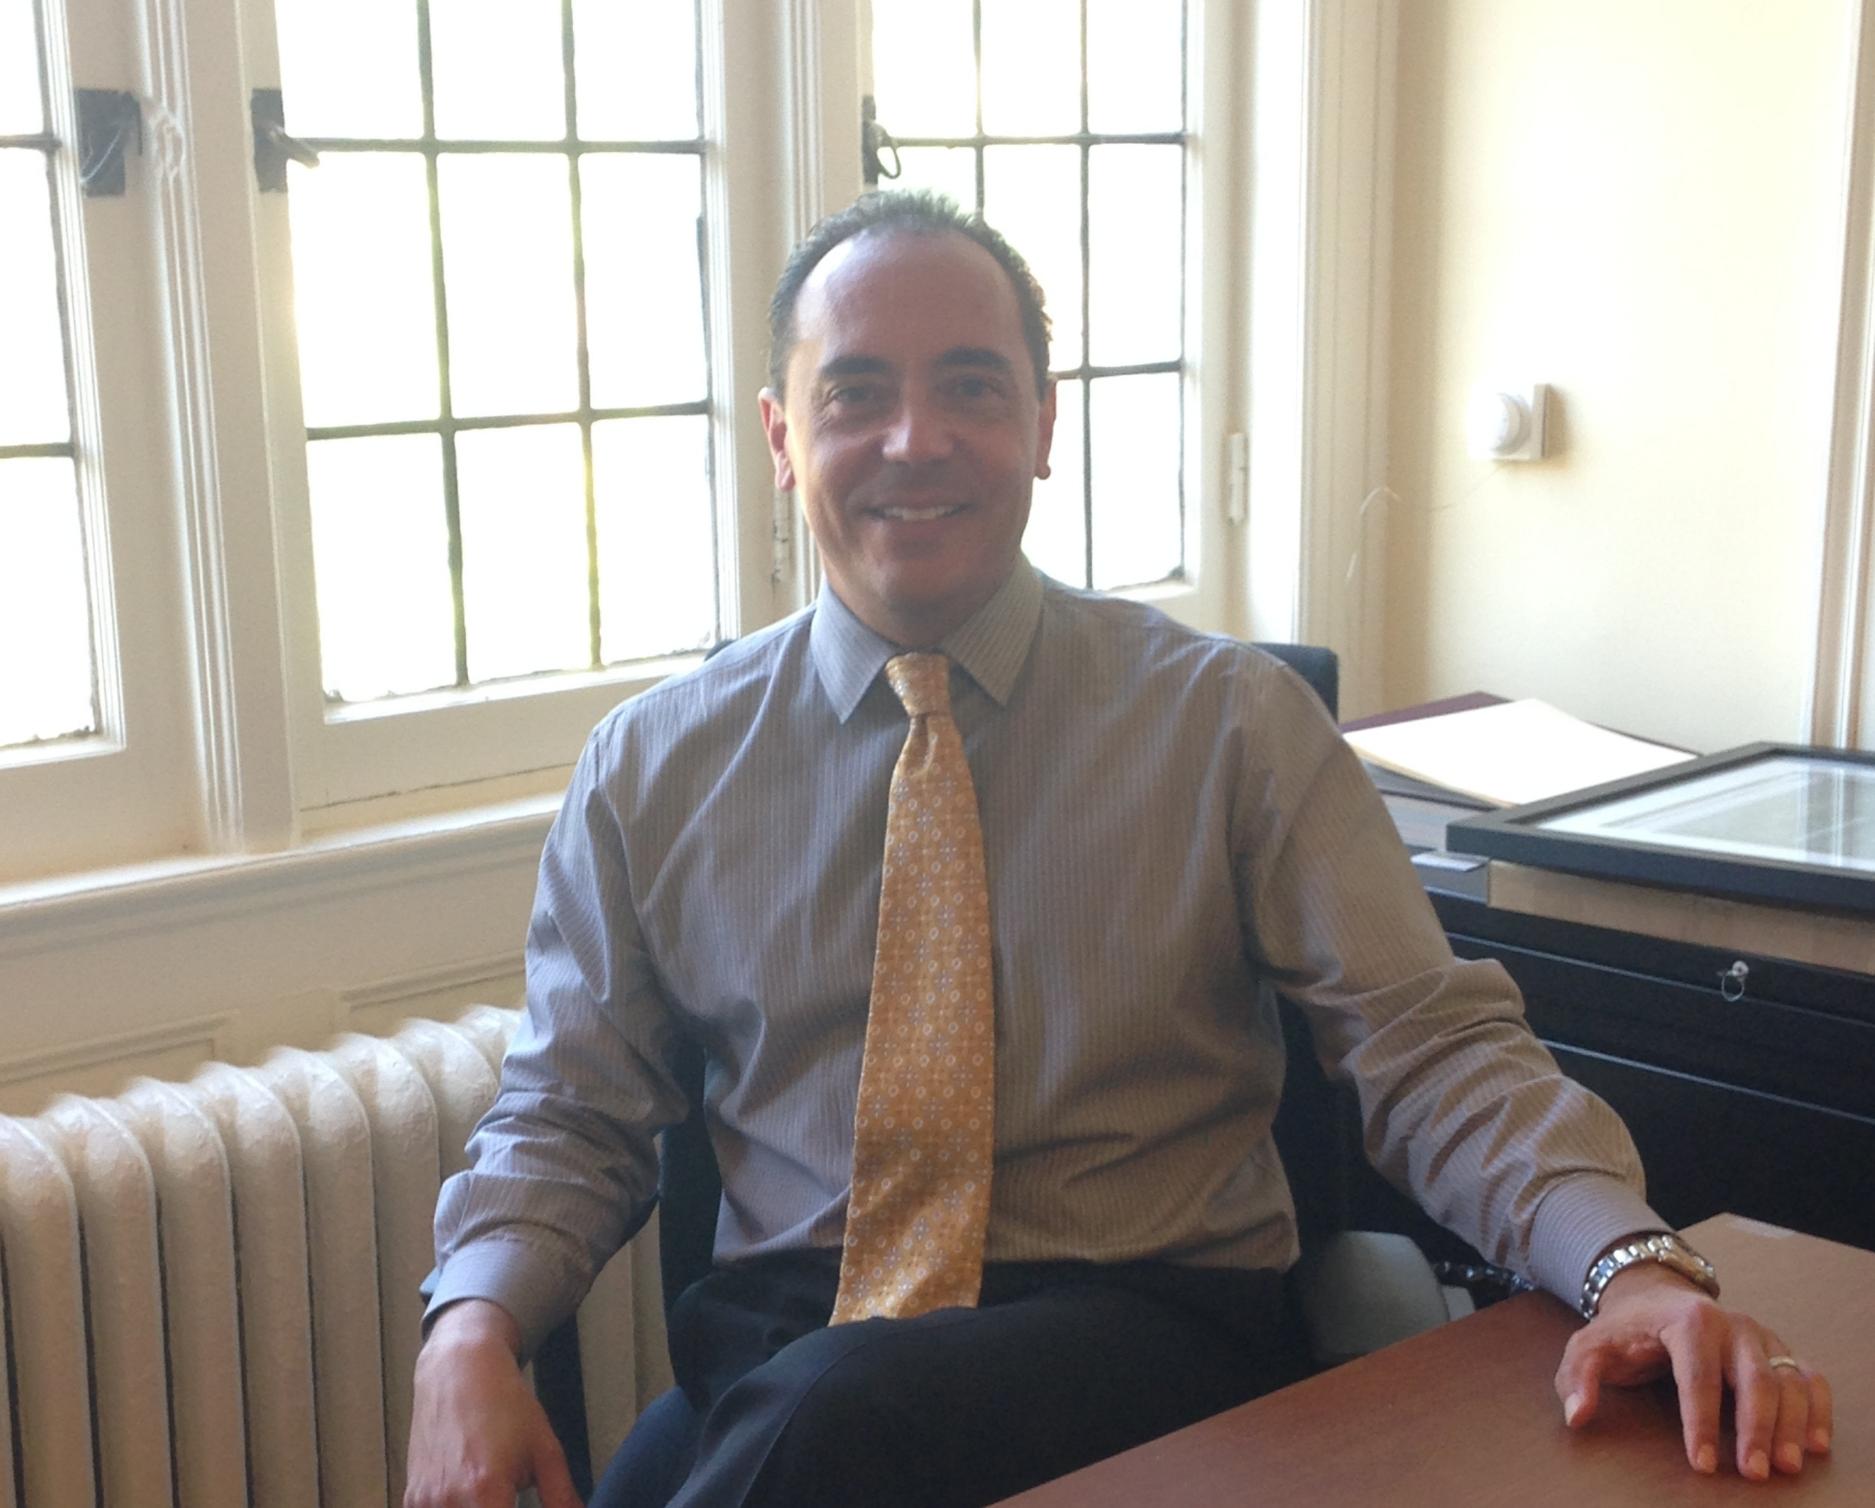 Dean Daniel Trujillo in his office in Westlands. Photo by Janaki Chadha '17